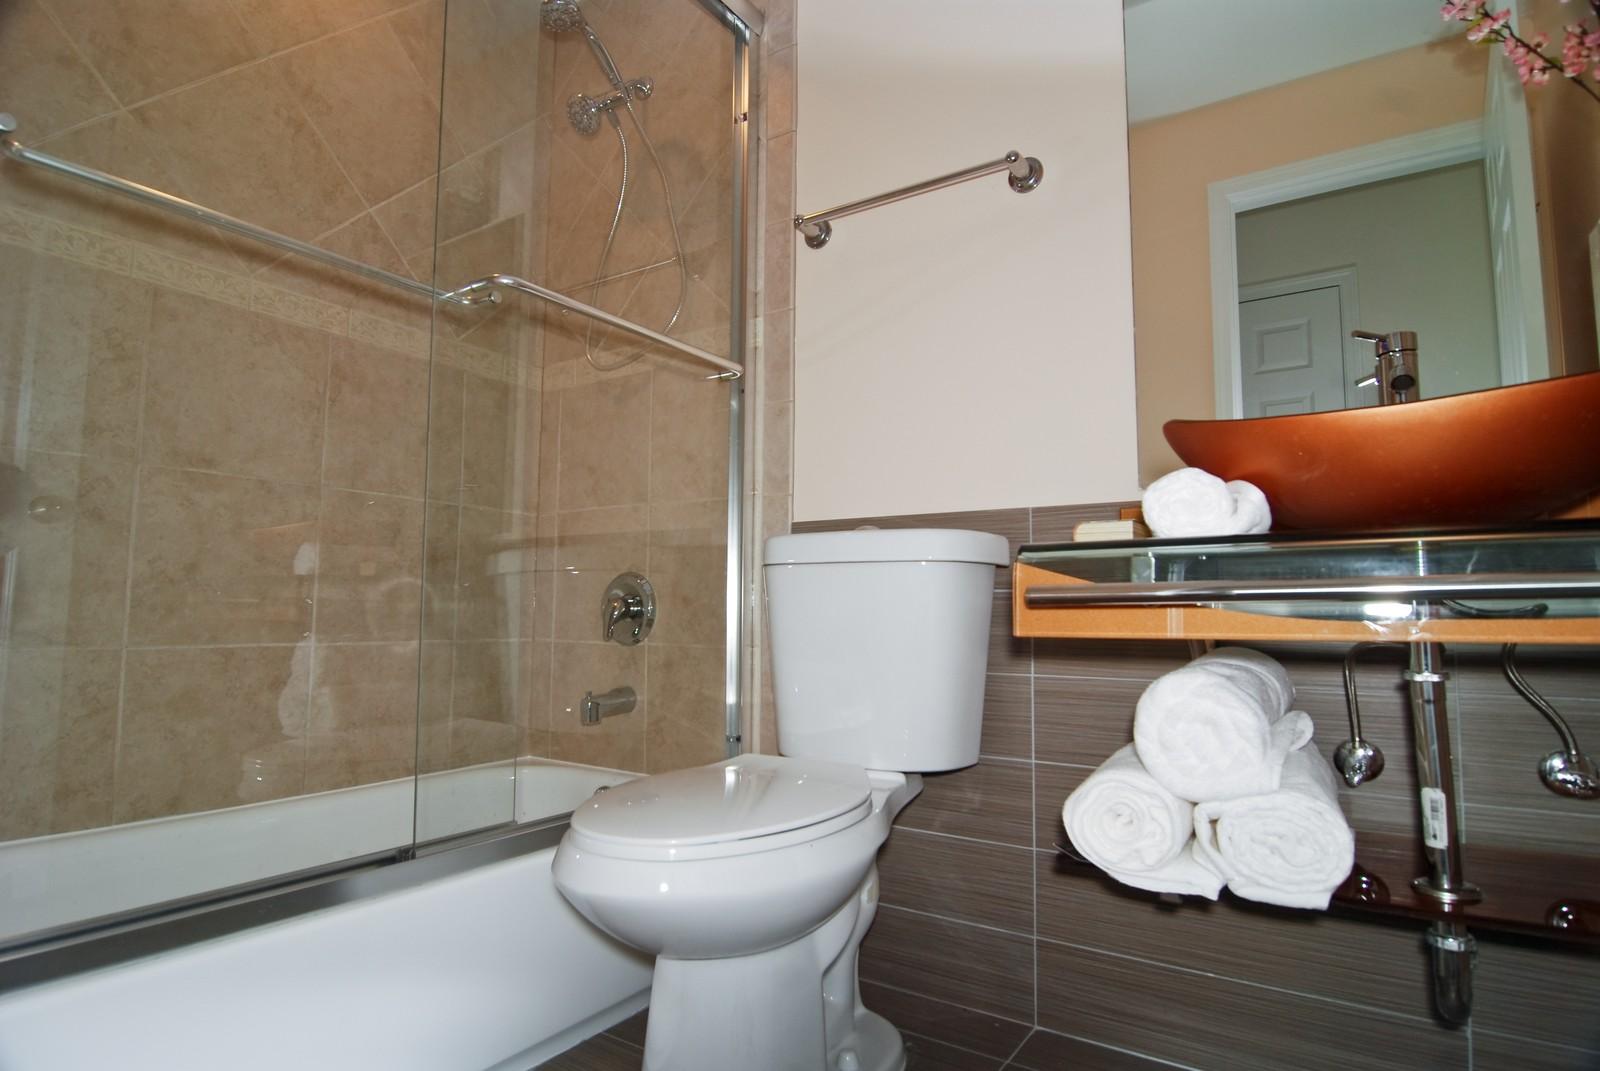 Real Estate Photography - 2805 N 75th Ct, Unit 1B, Elmwood Park, IL, 60707 - Bathroom